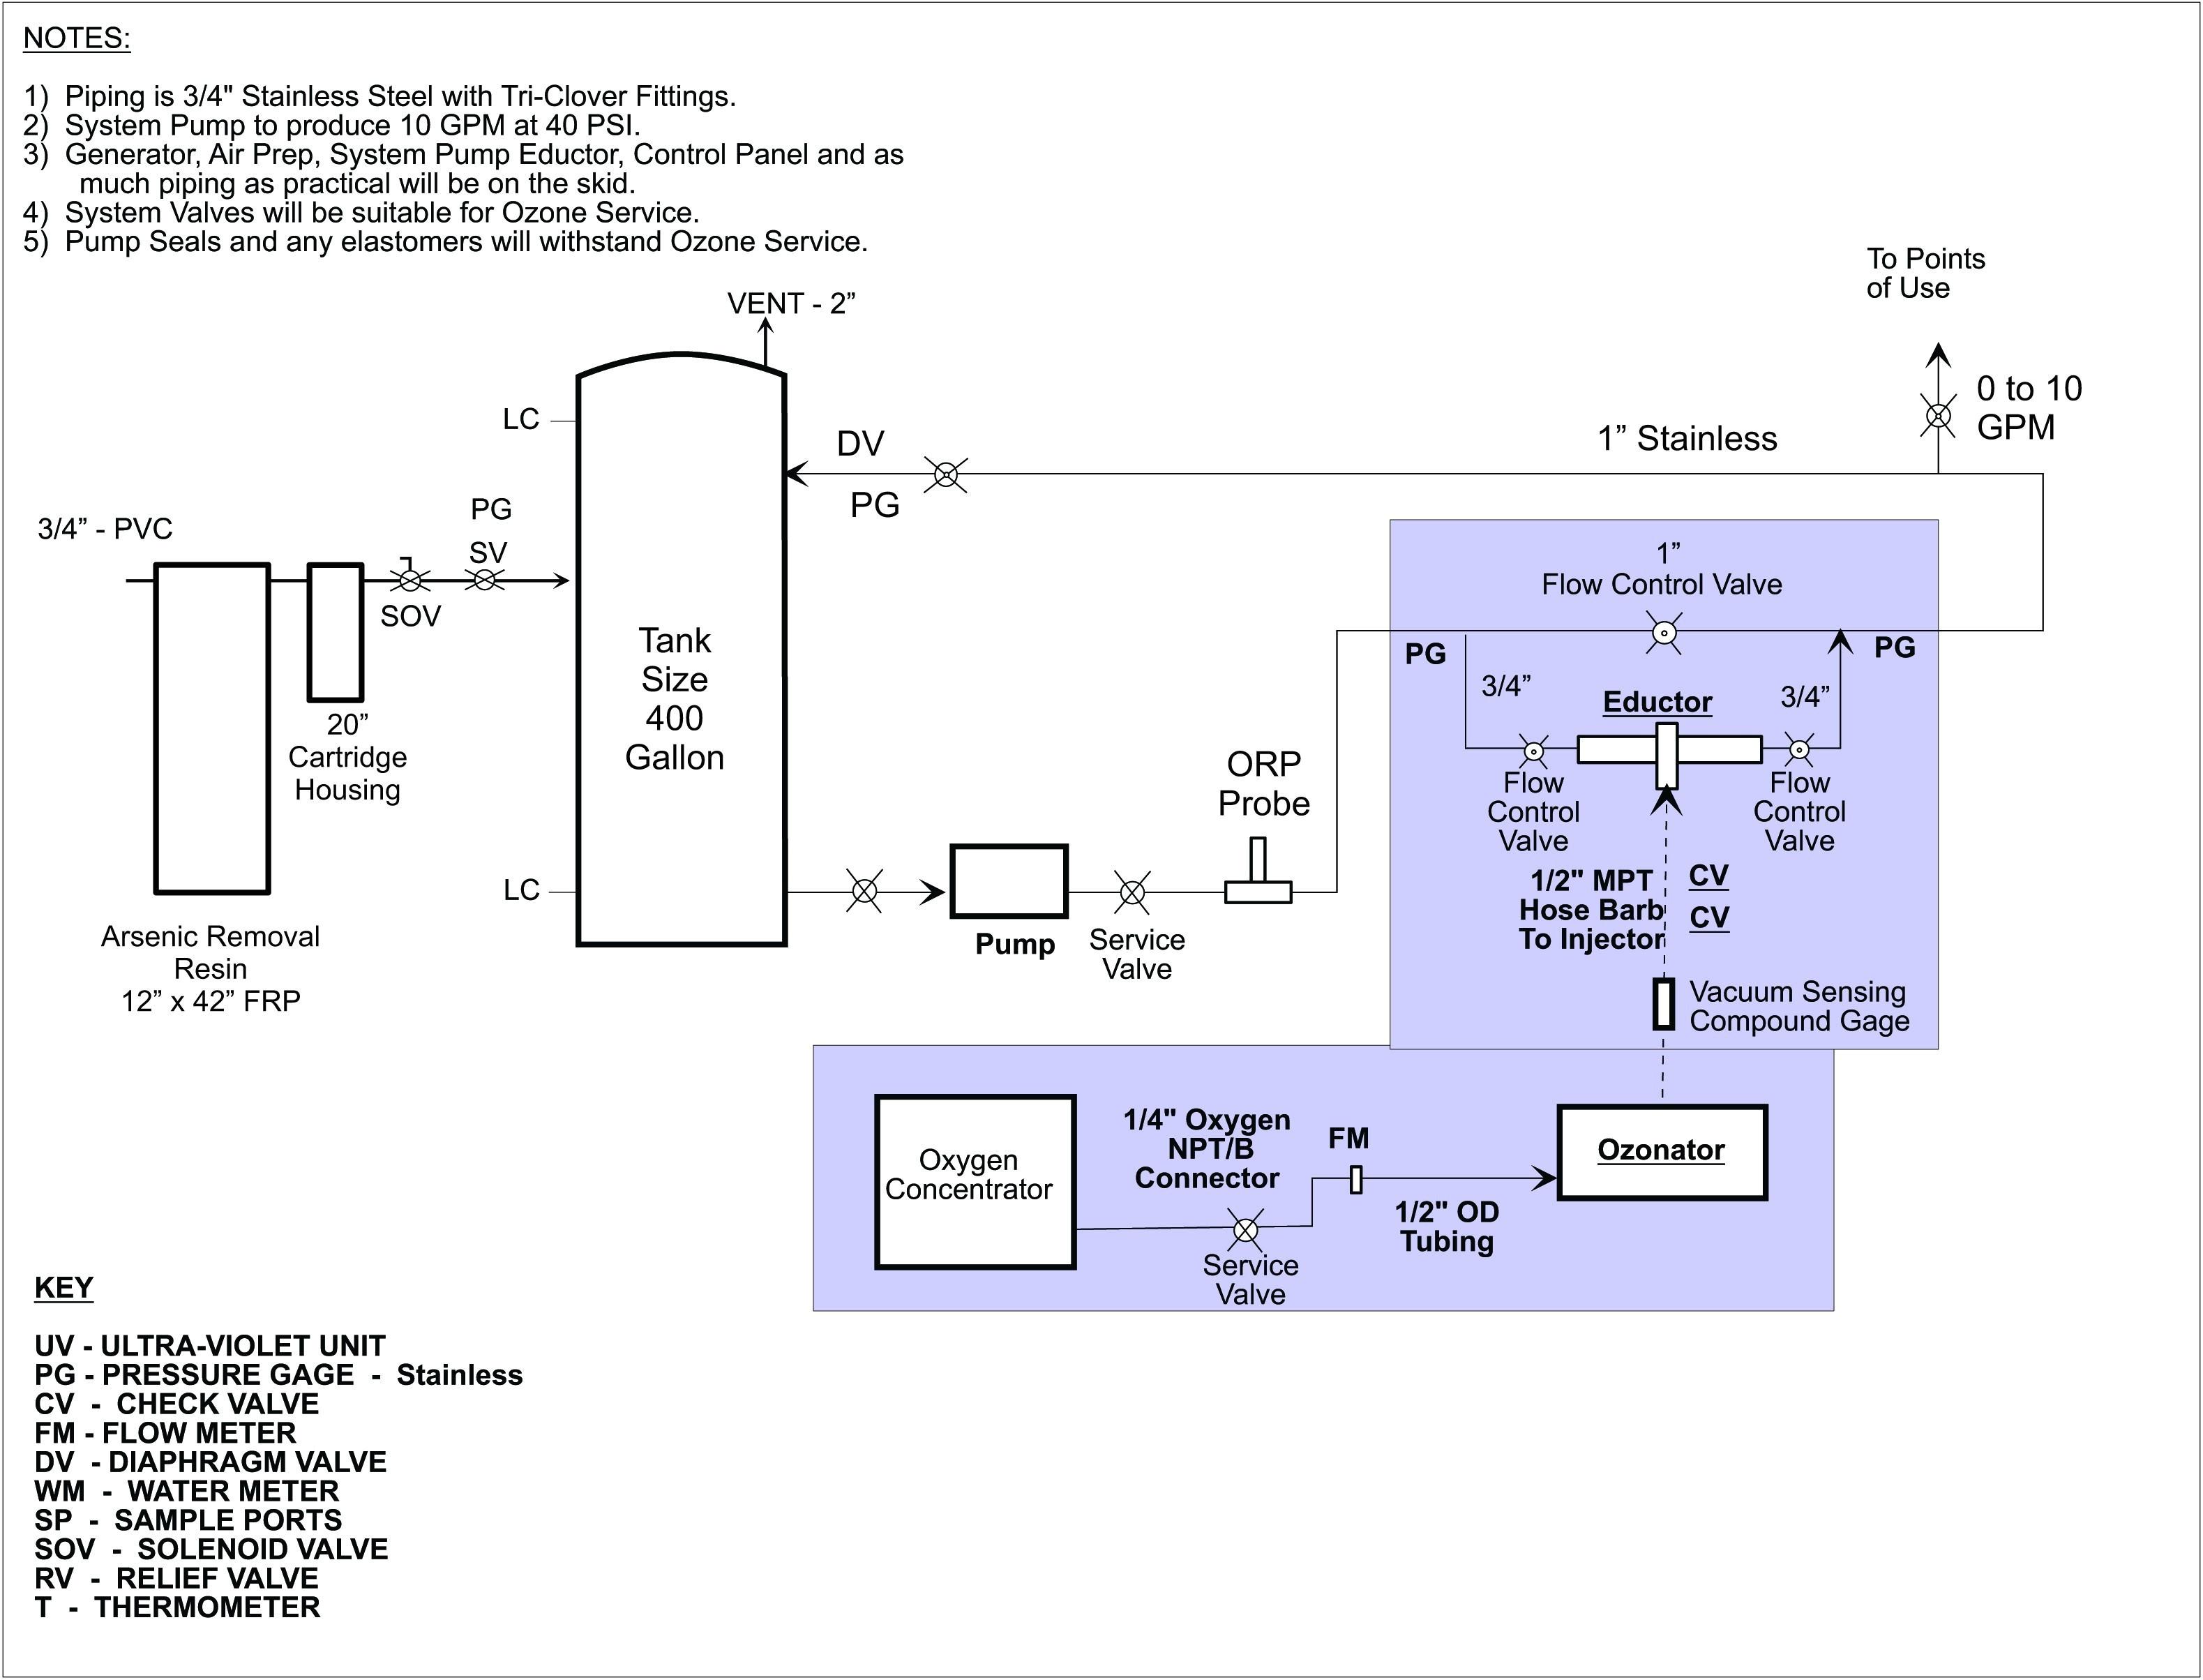 asco 962 wiring diagram wiring diagram imgasco 962 wiring diagram wiring diagram load asco 962 wiring